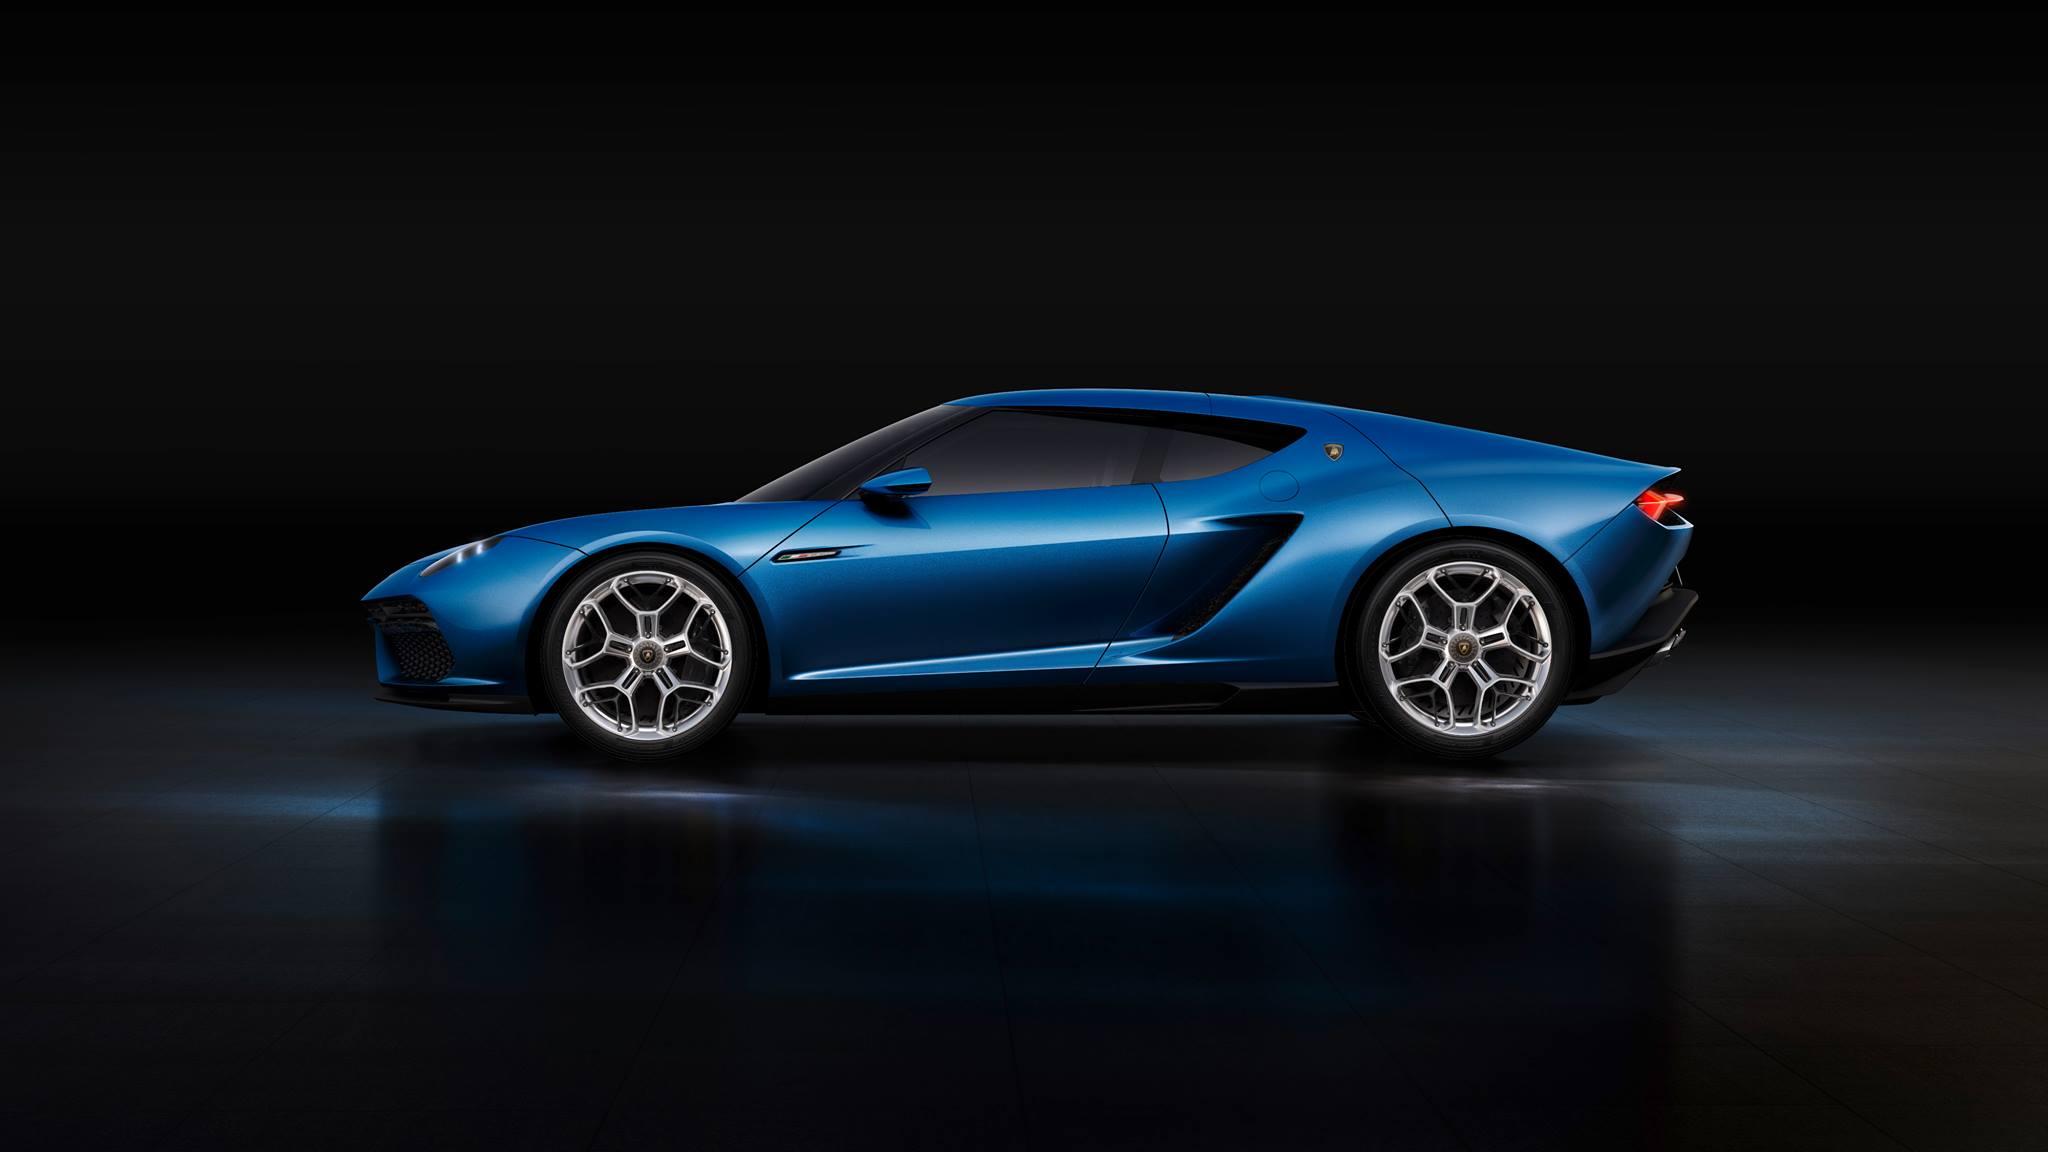 Lamborghini Asterion Hybrid Car